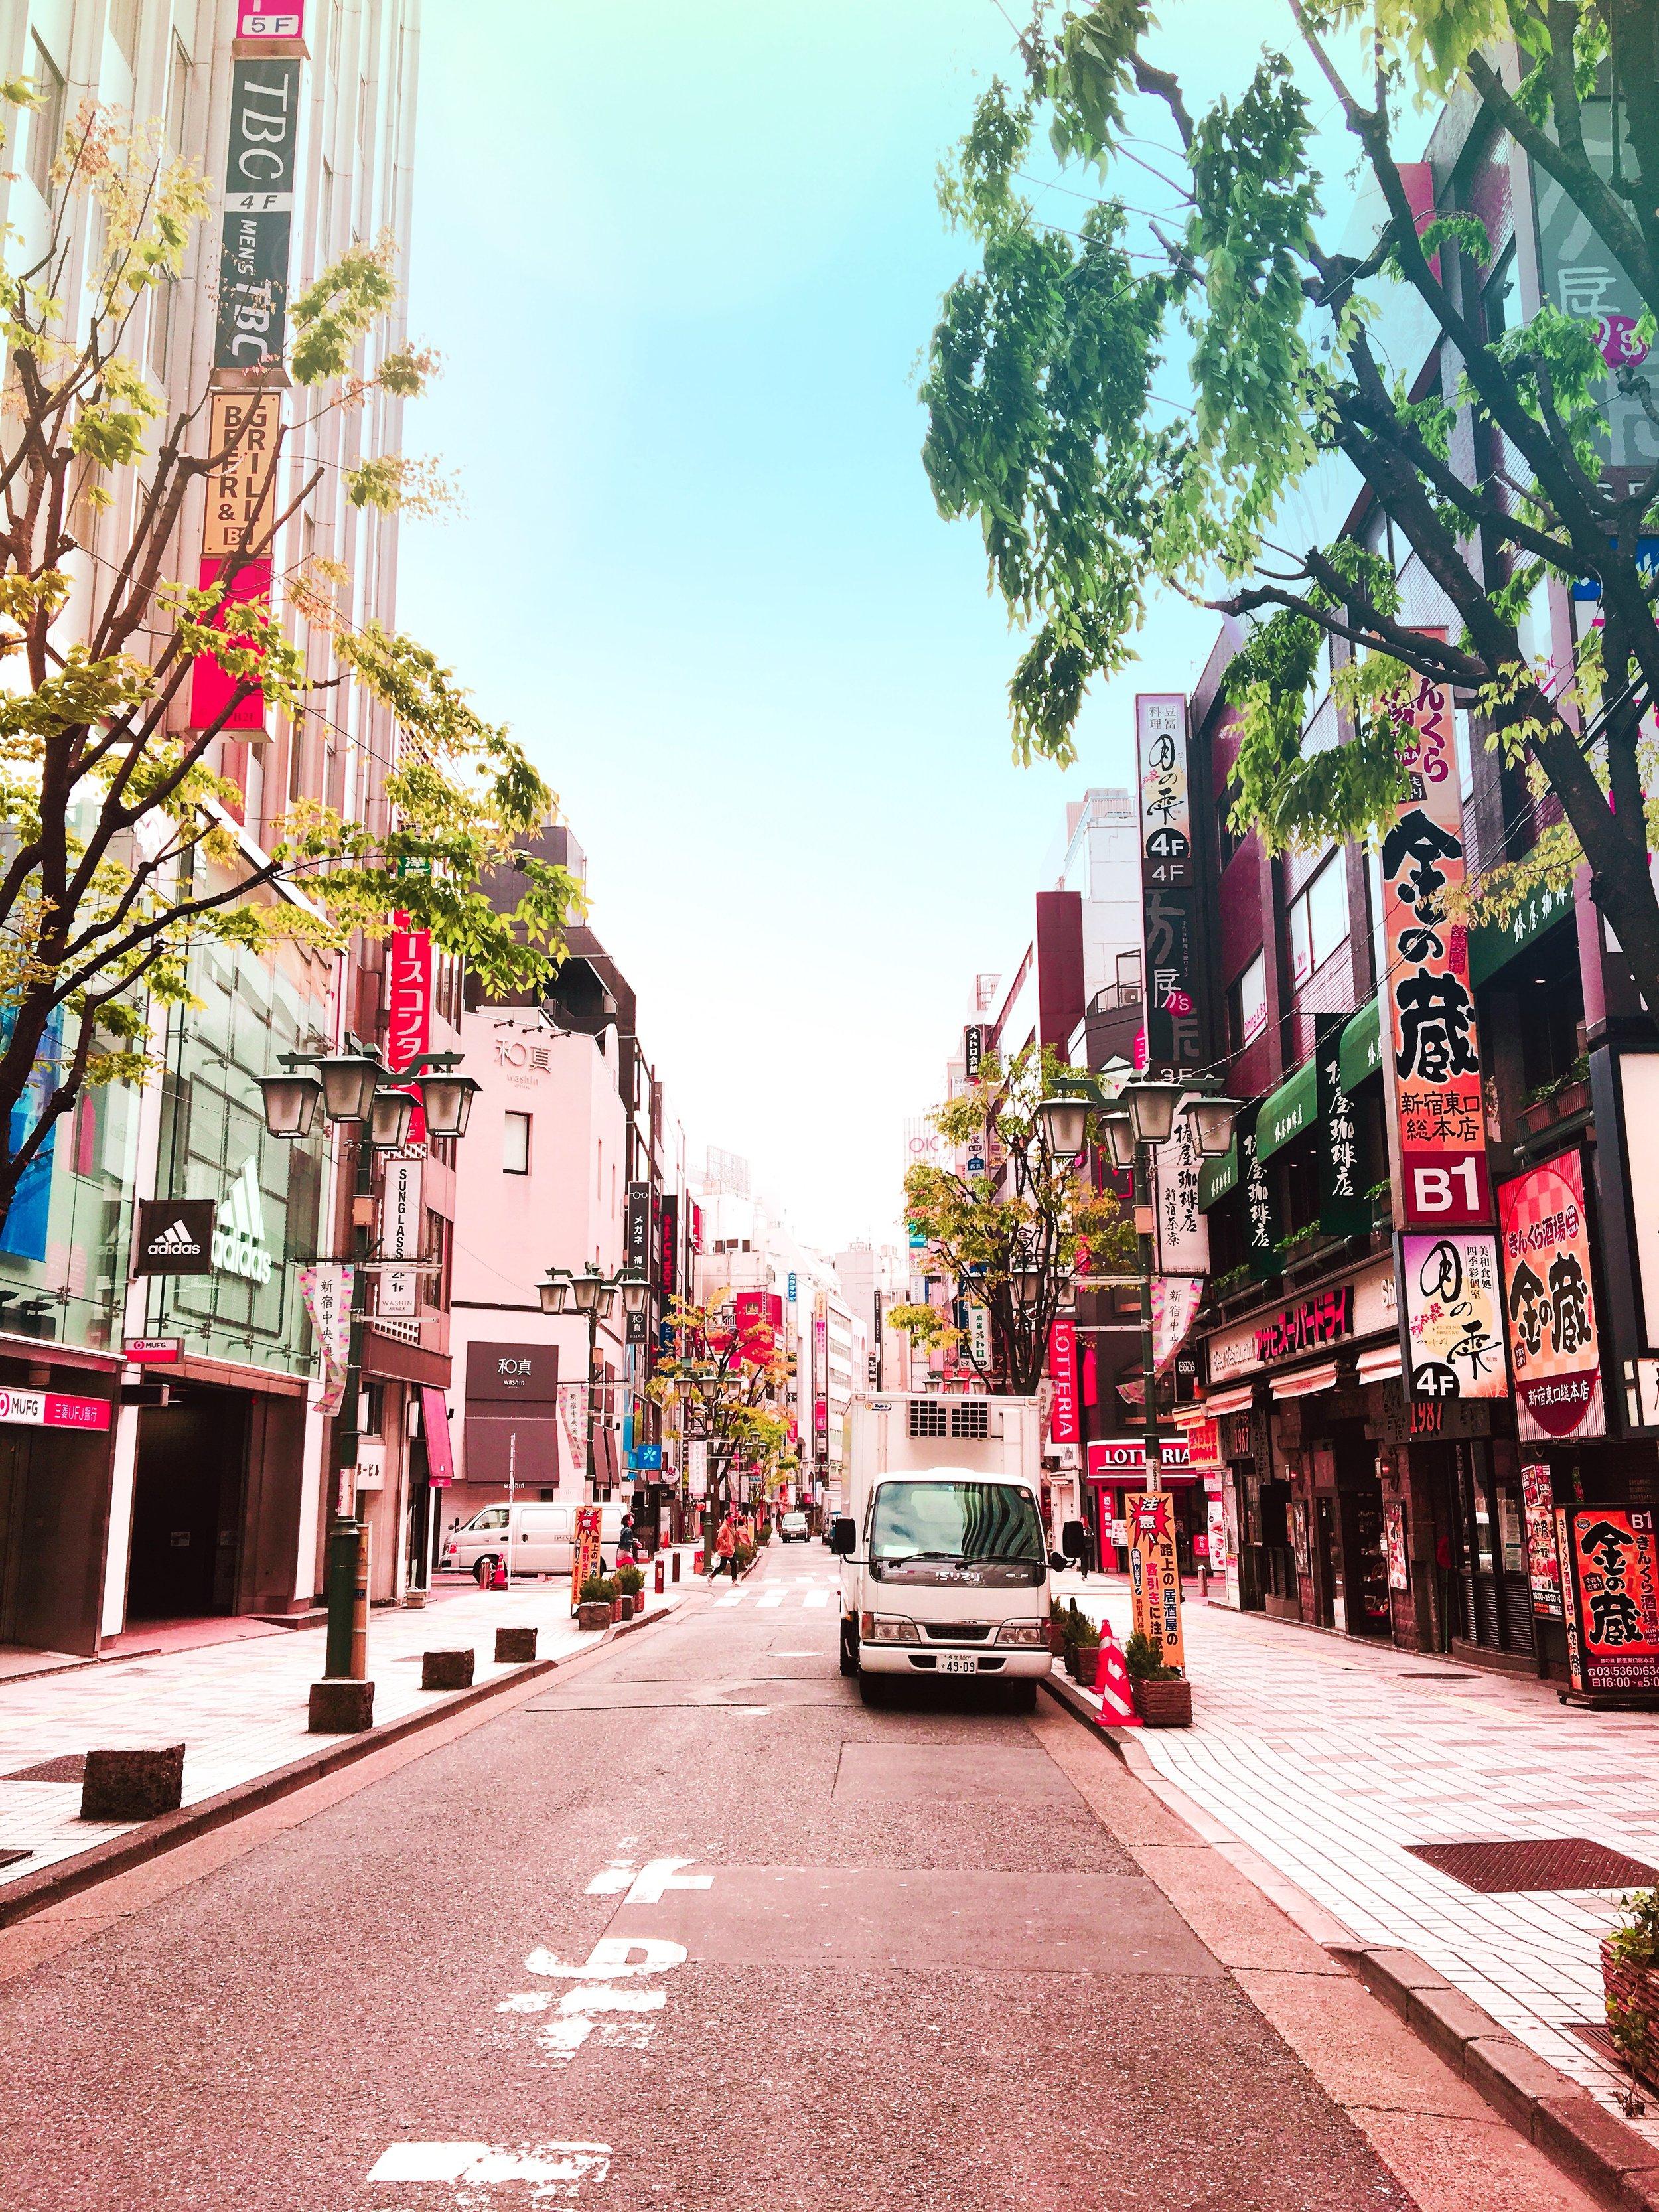 THE FUNKY FRESH / JAPAN TOKYO STREETS